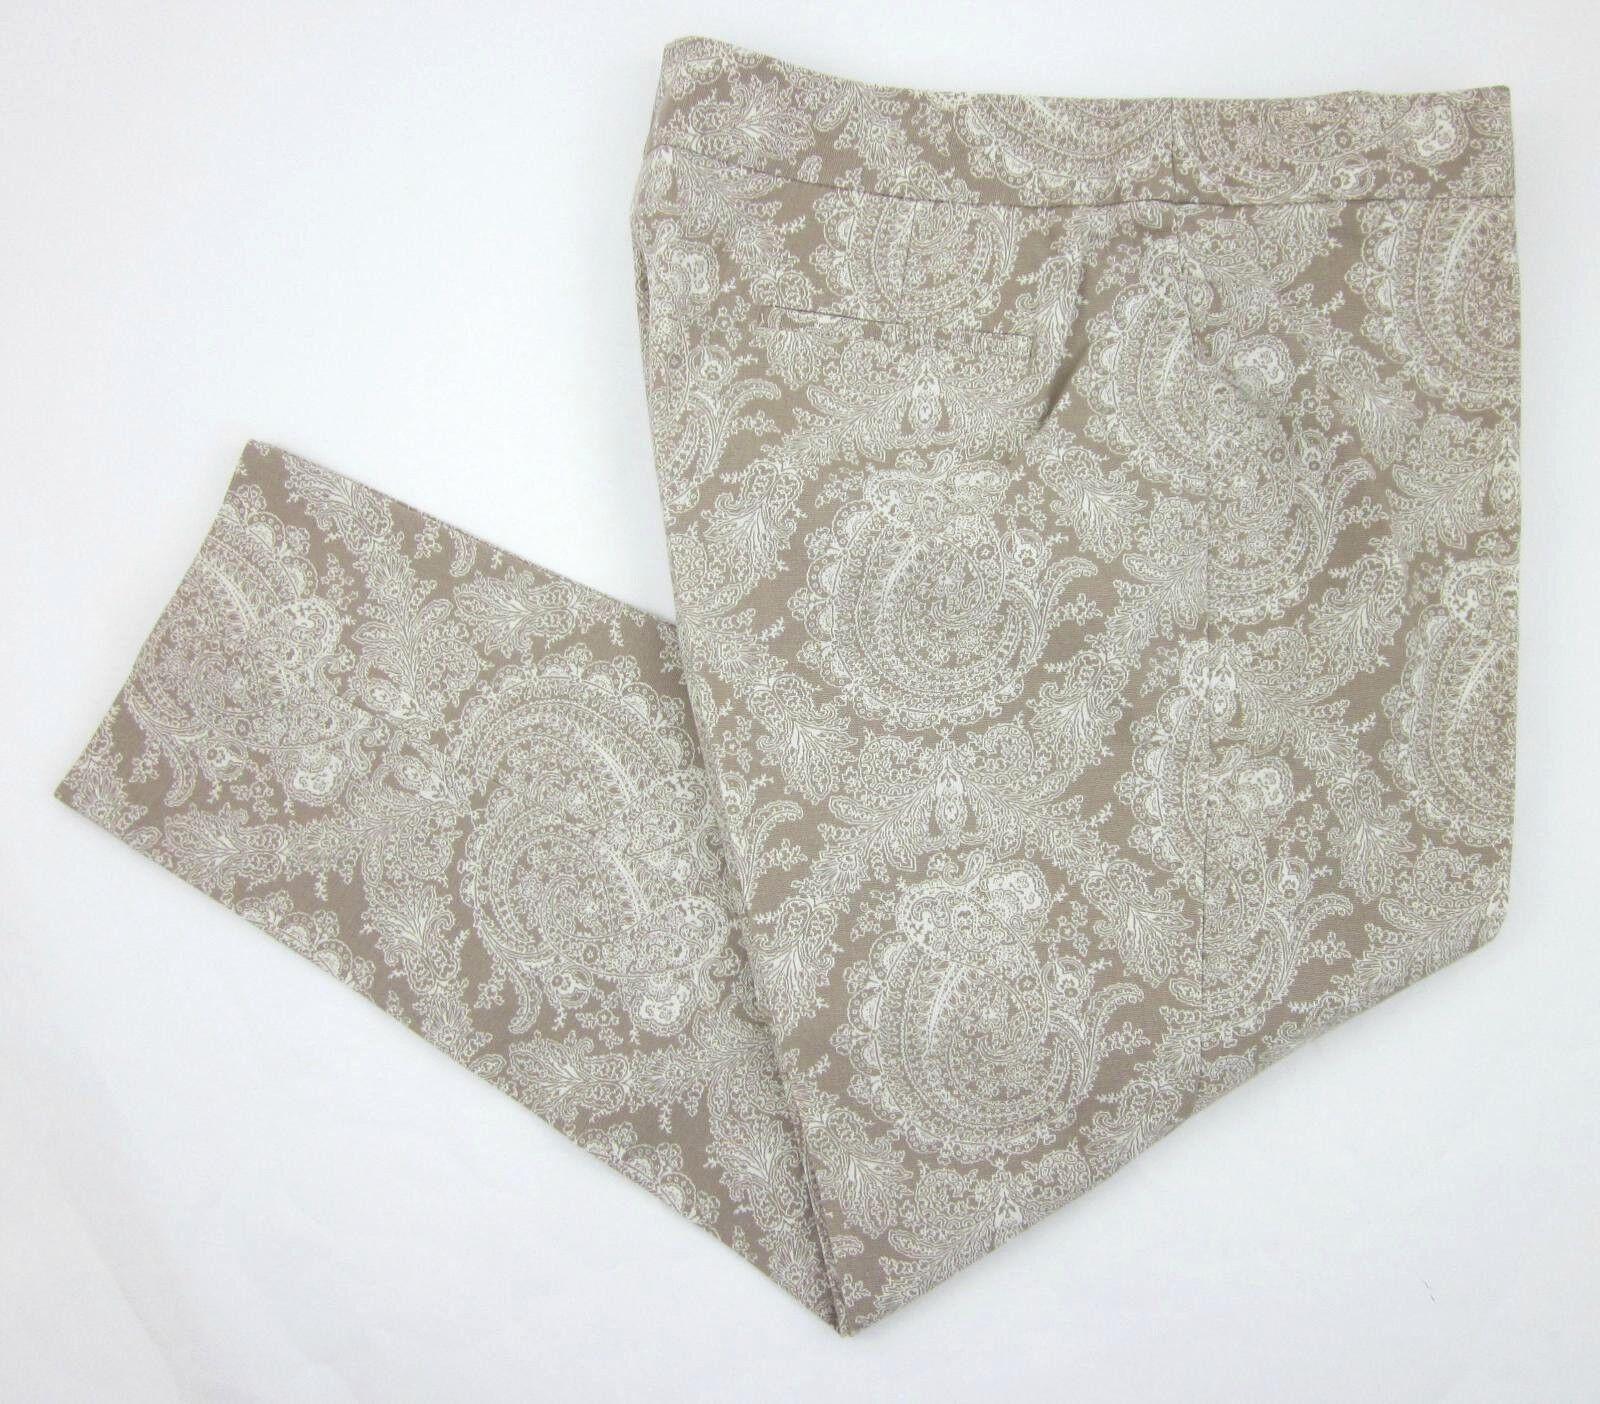 Talbots Heritage Fit Paisley Tan White Stretch Cotton Ankle Pants Sz 16